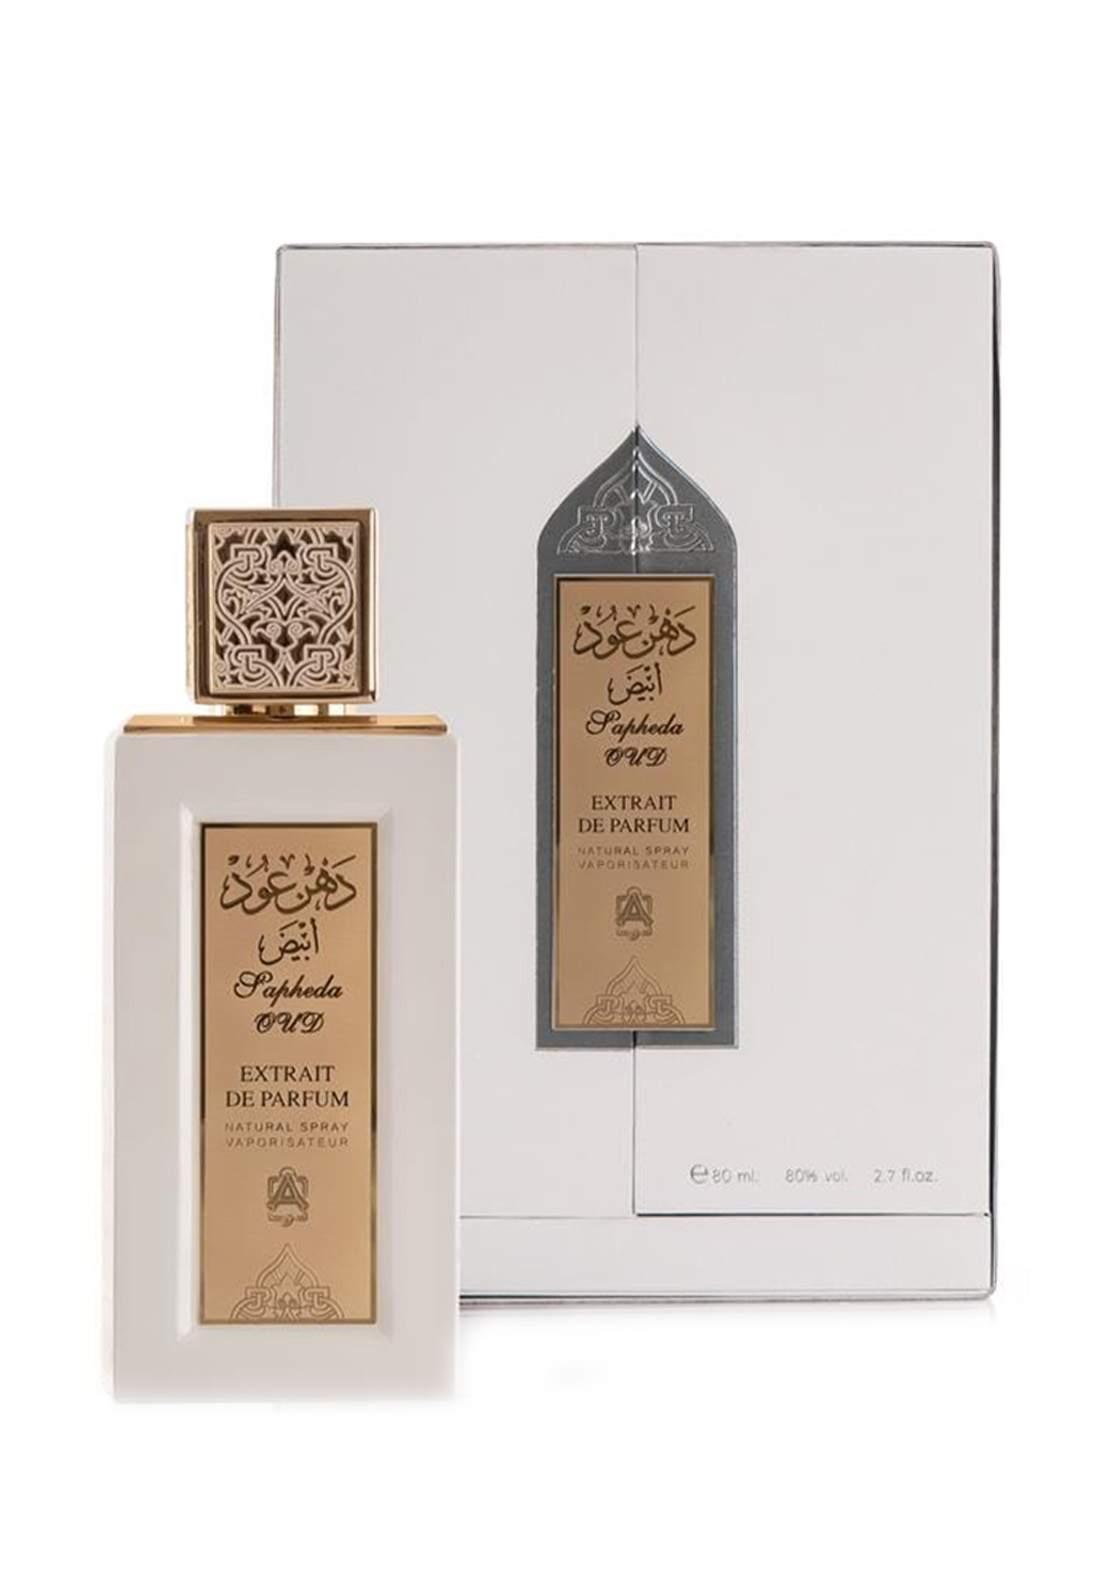 Abdul Samad Al Qurashi 71385 Sapheda White Oud Perfume 80ml عطر